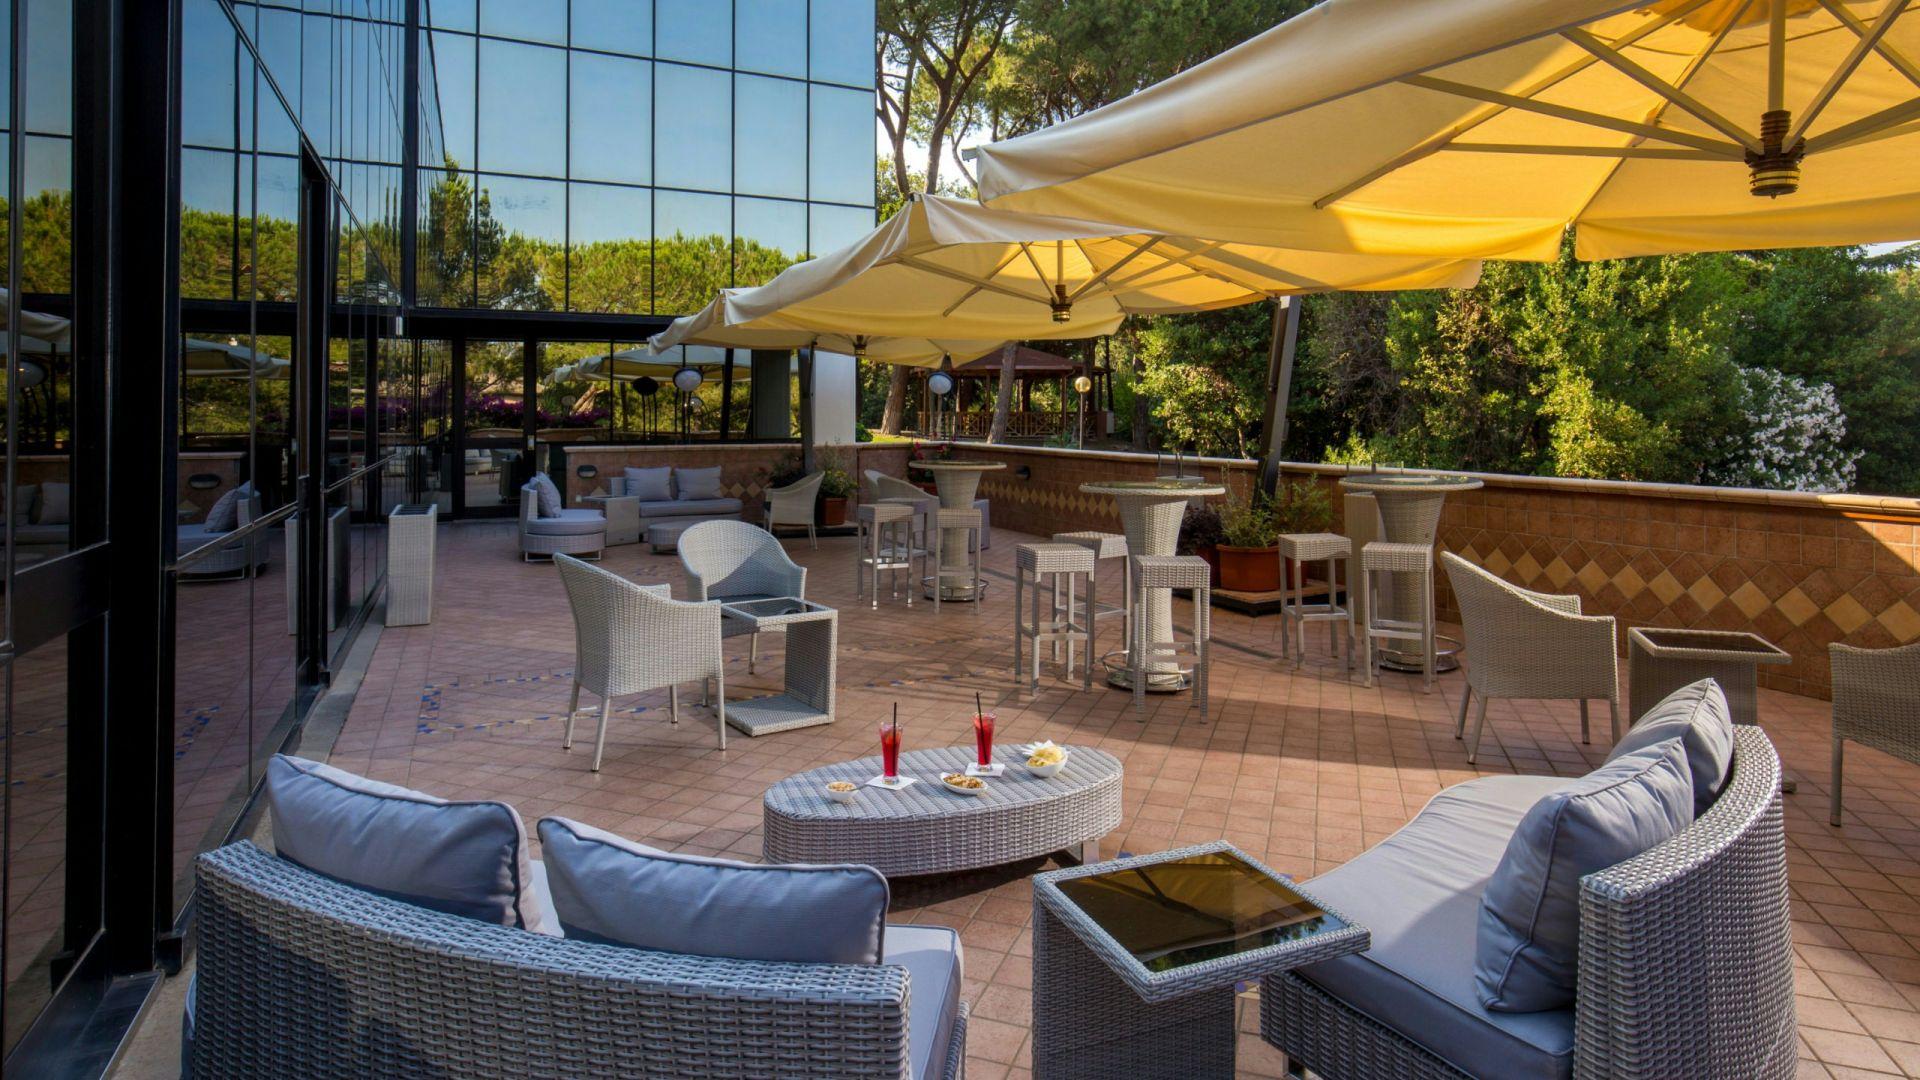 villa-aurelia-hotel-rome-rooftop-bar-02